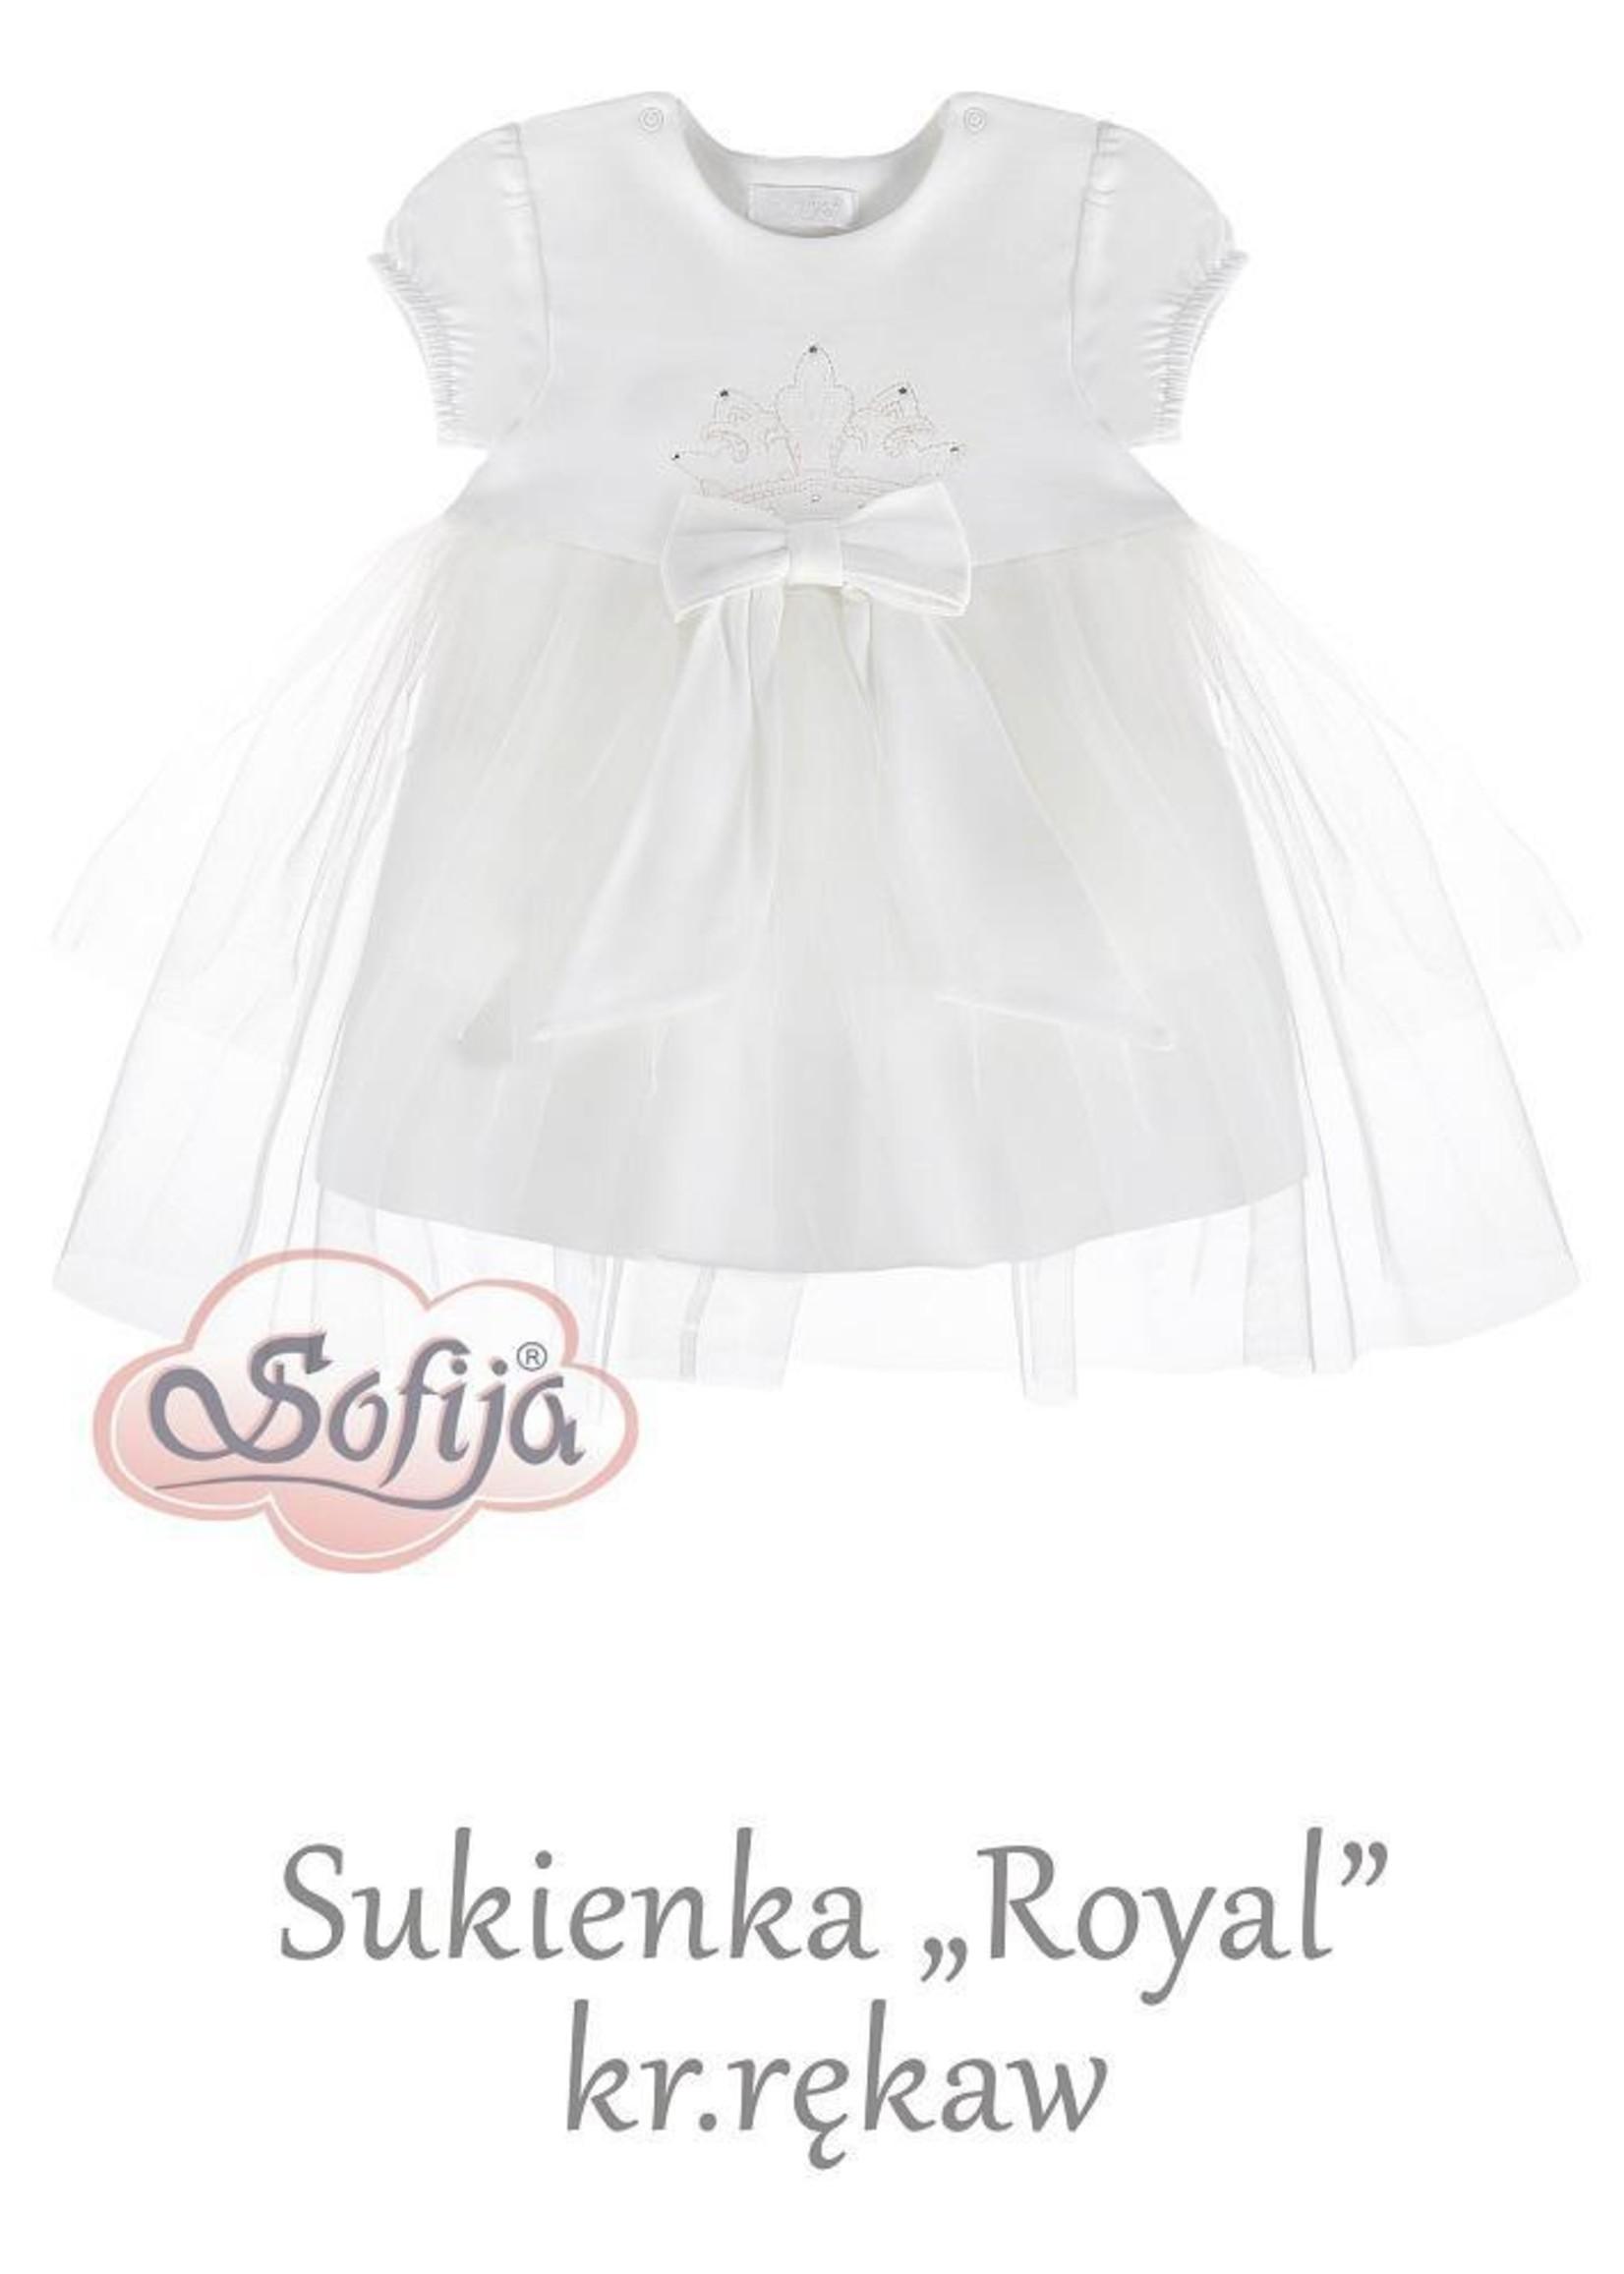 Sofija Sofija crown dress short sleeve